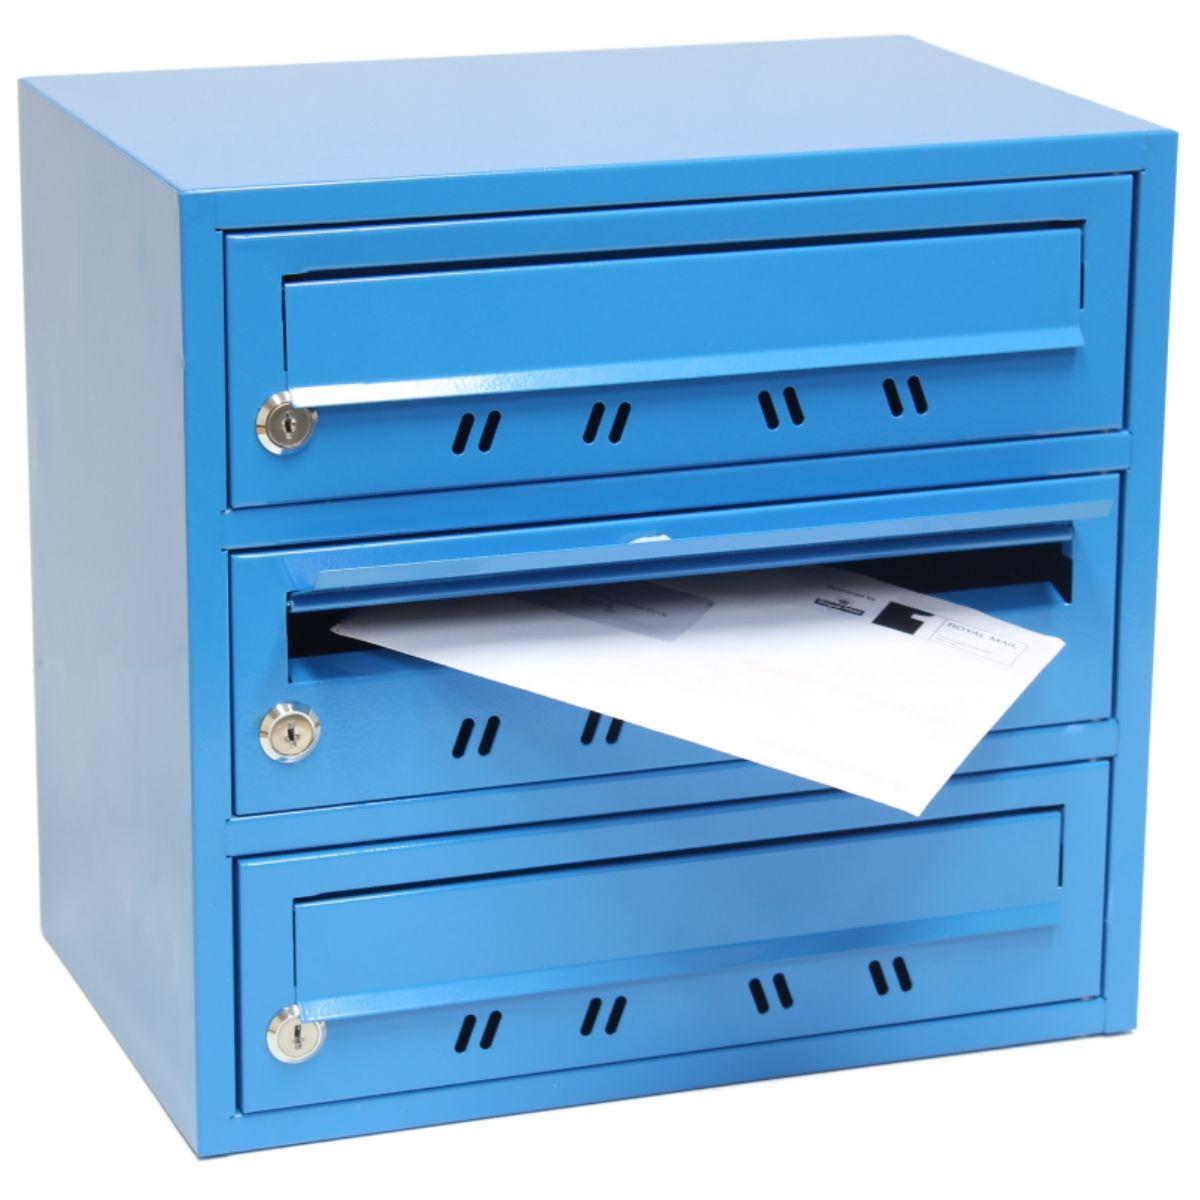 Lockable 3 Slot Pigeon Hole Letterbox Mail Multi Post Box